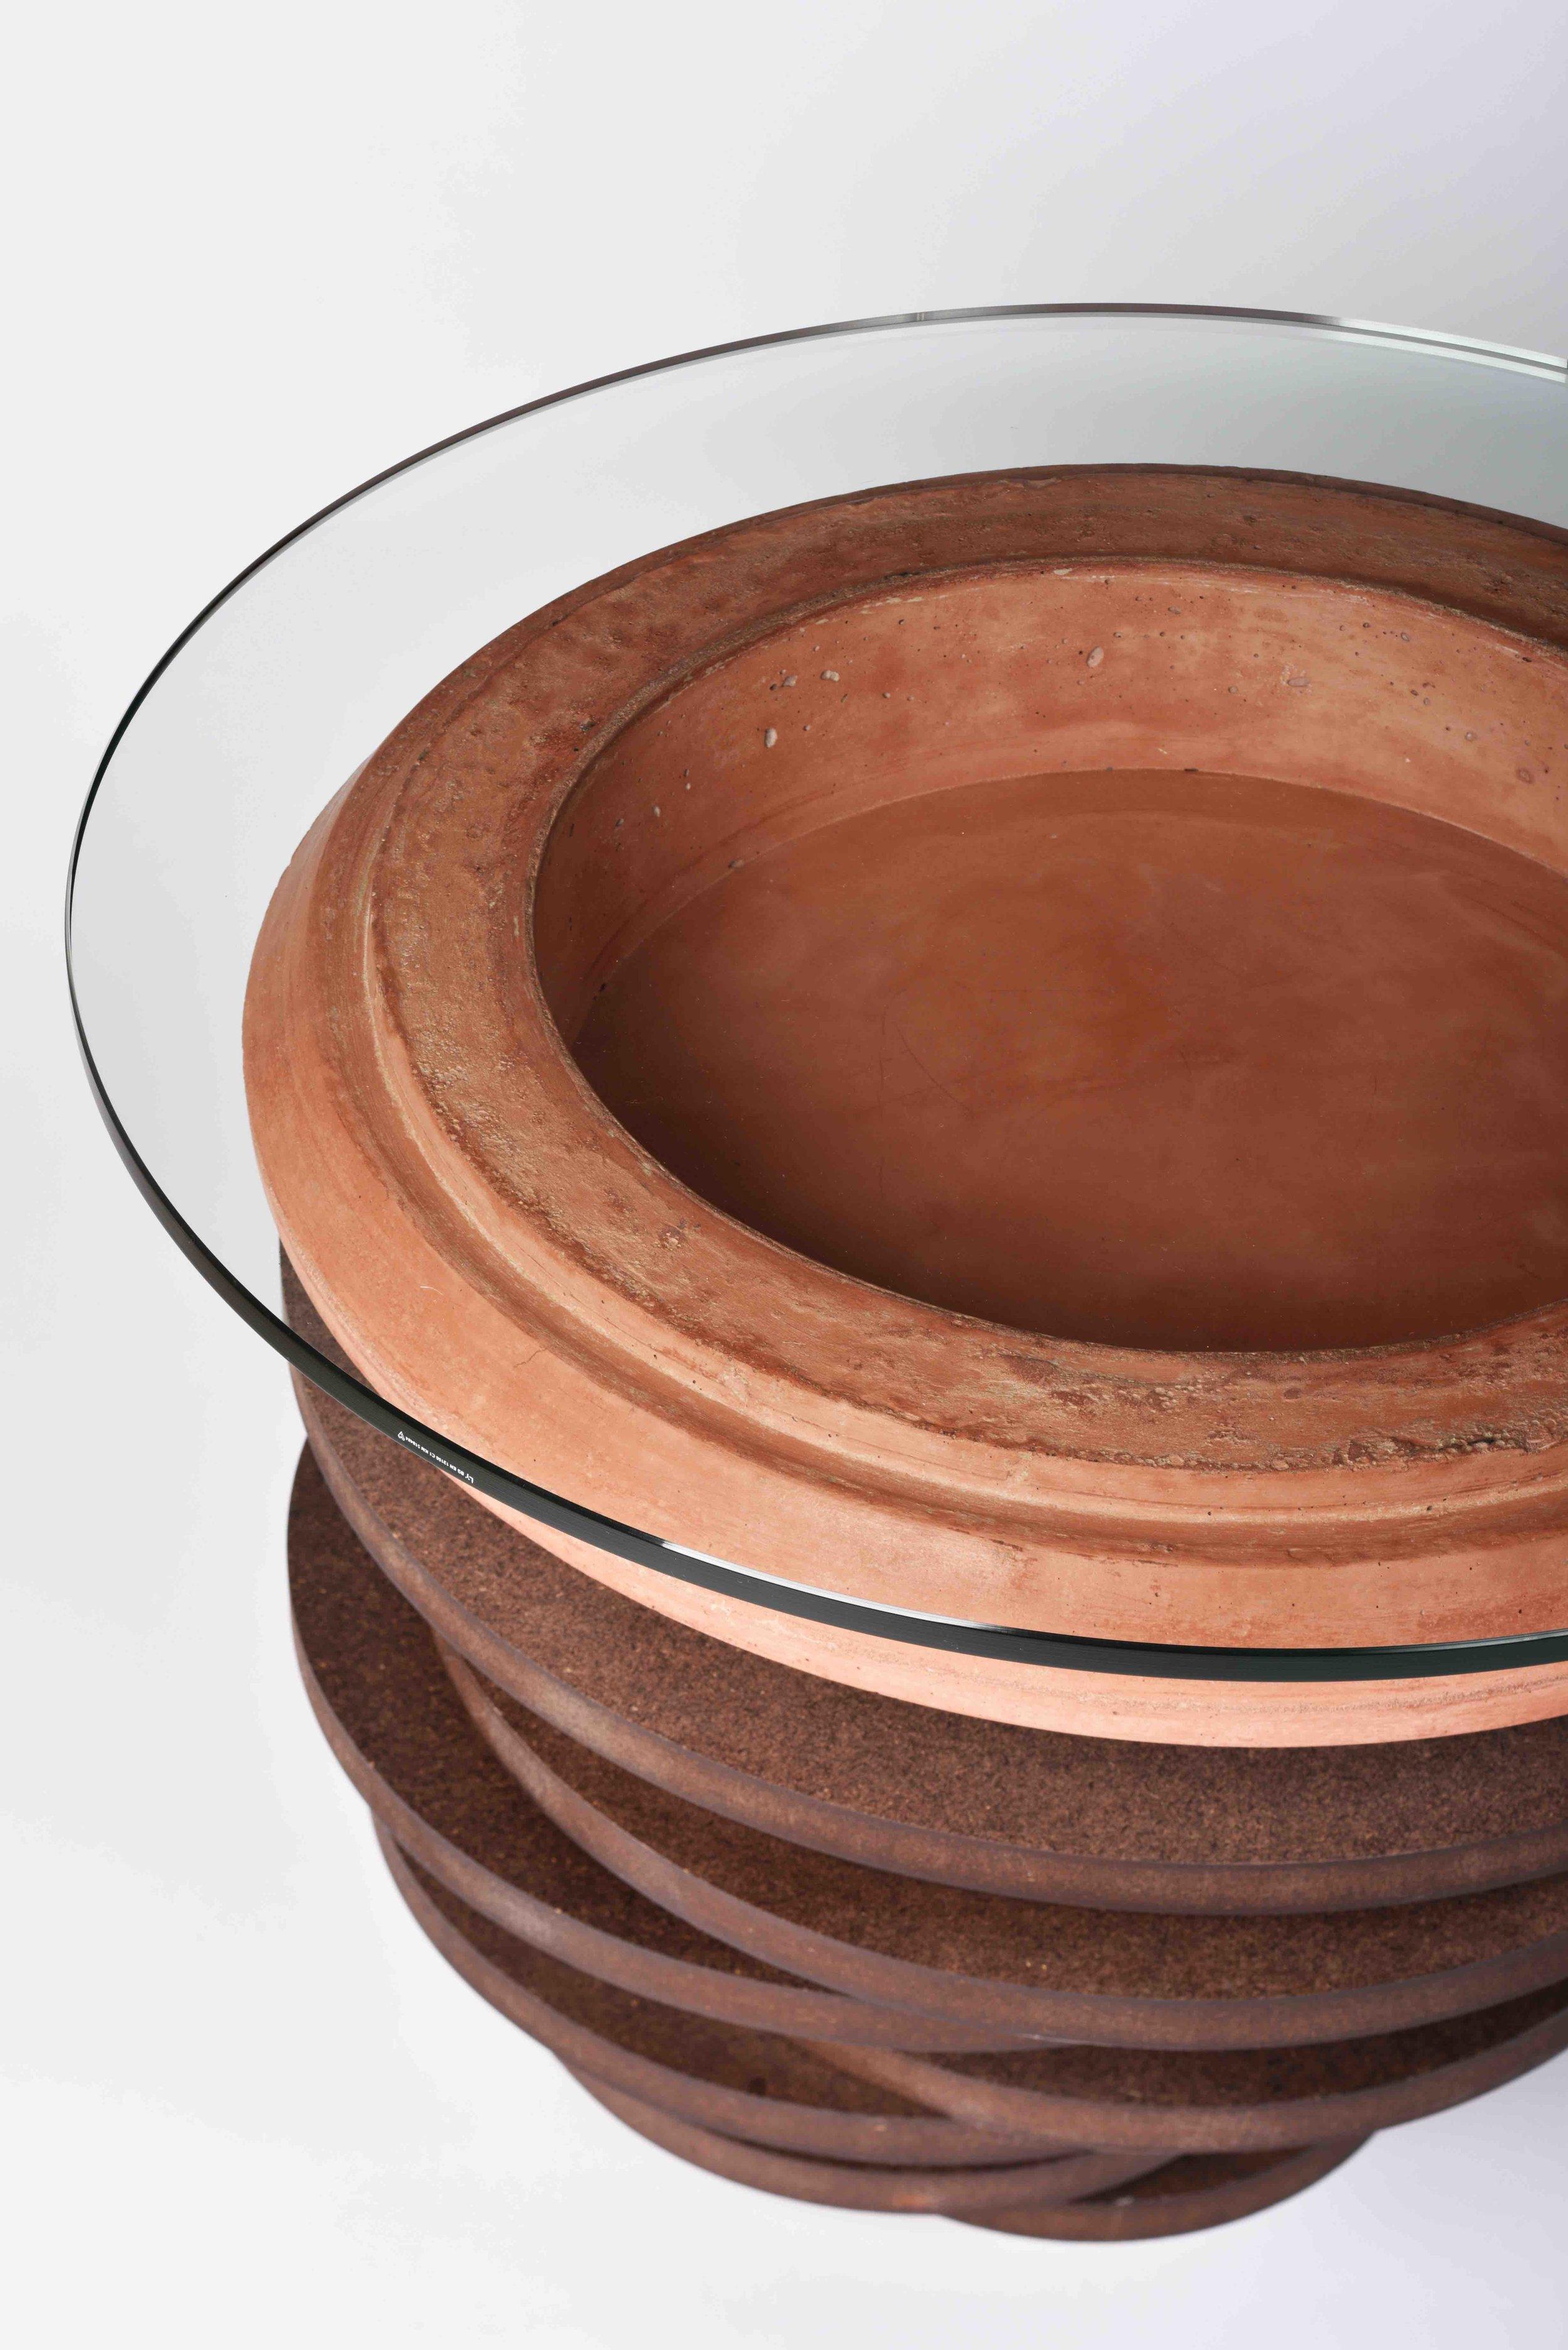 AFRICA BY DESIGN_AMWA D_Asanka Coffee Table Terracota BE copy.jpg